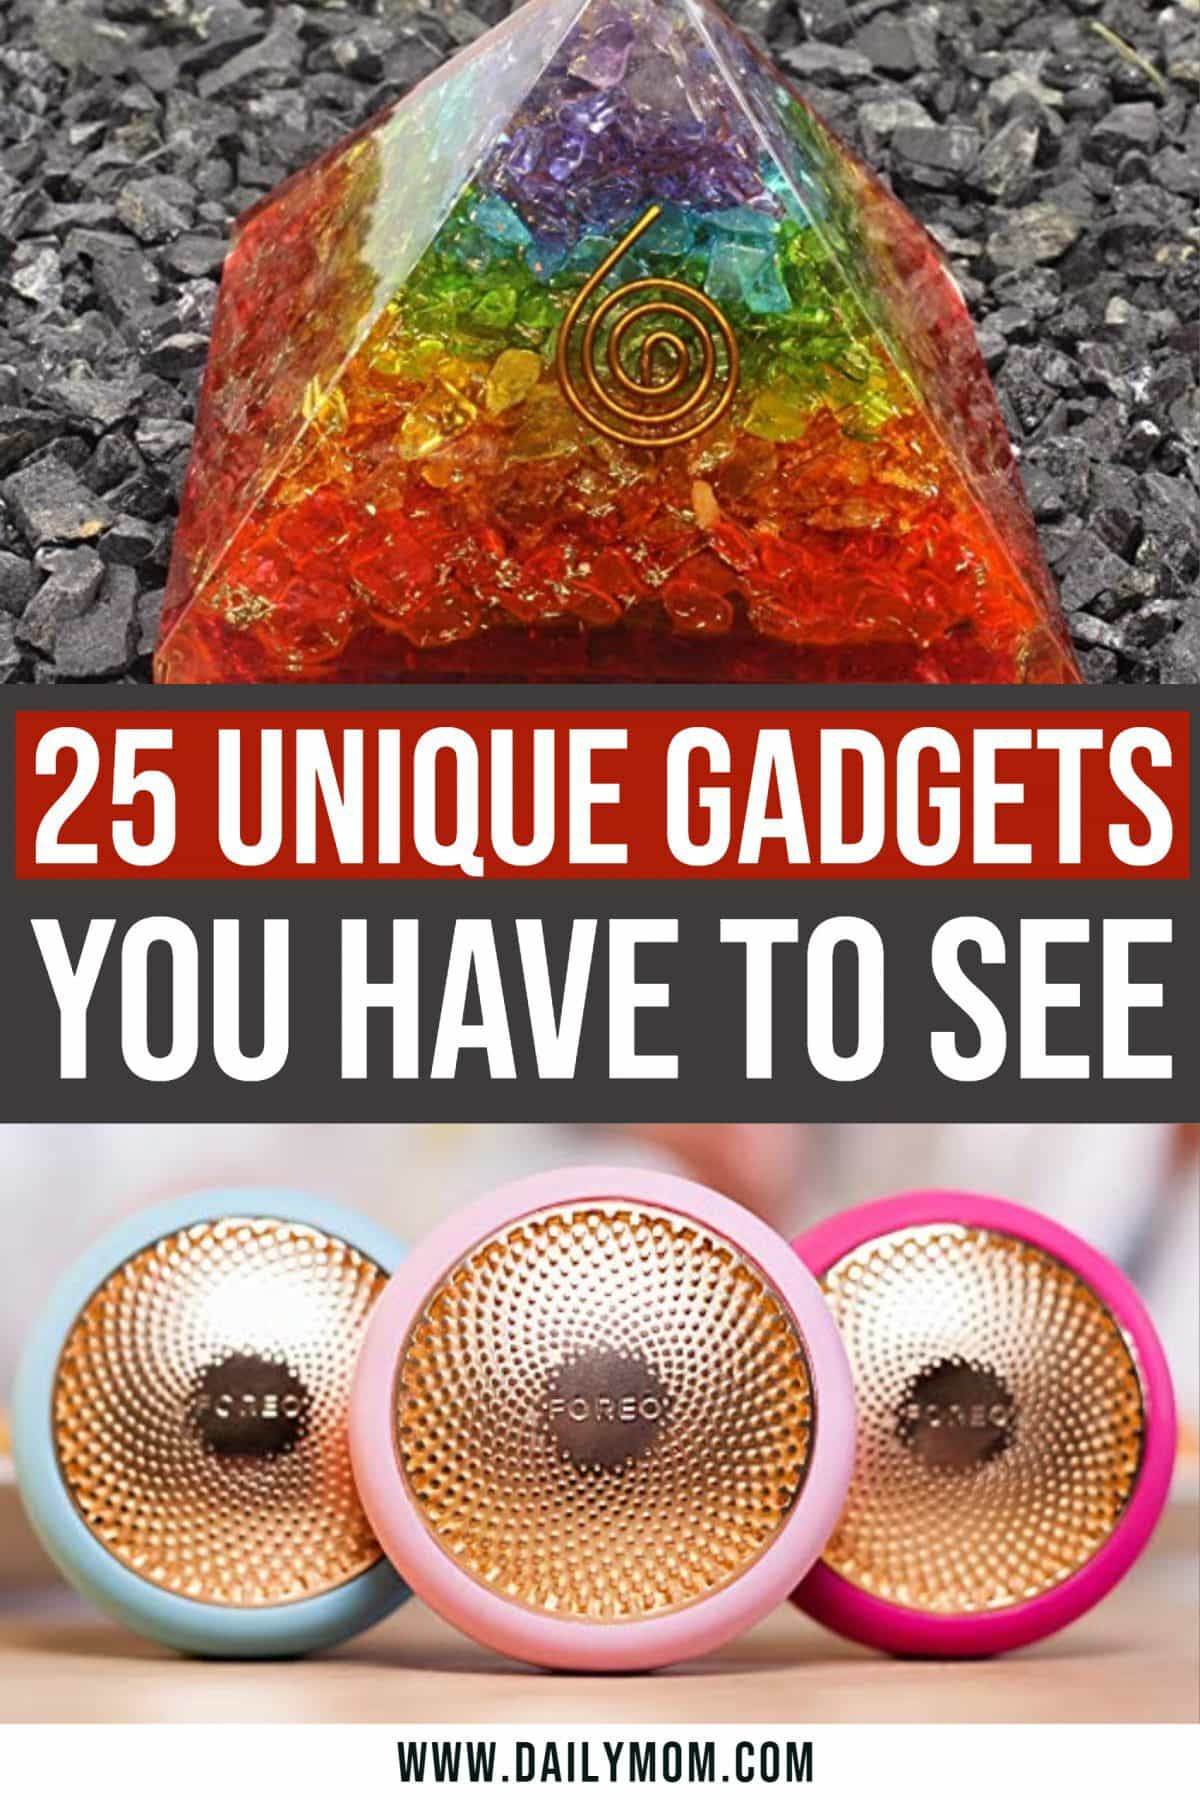 daily-mom-parent-portal-25 cool Gadgets